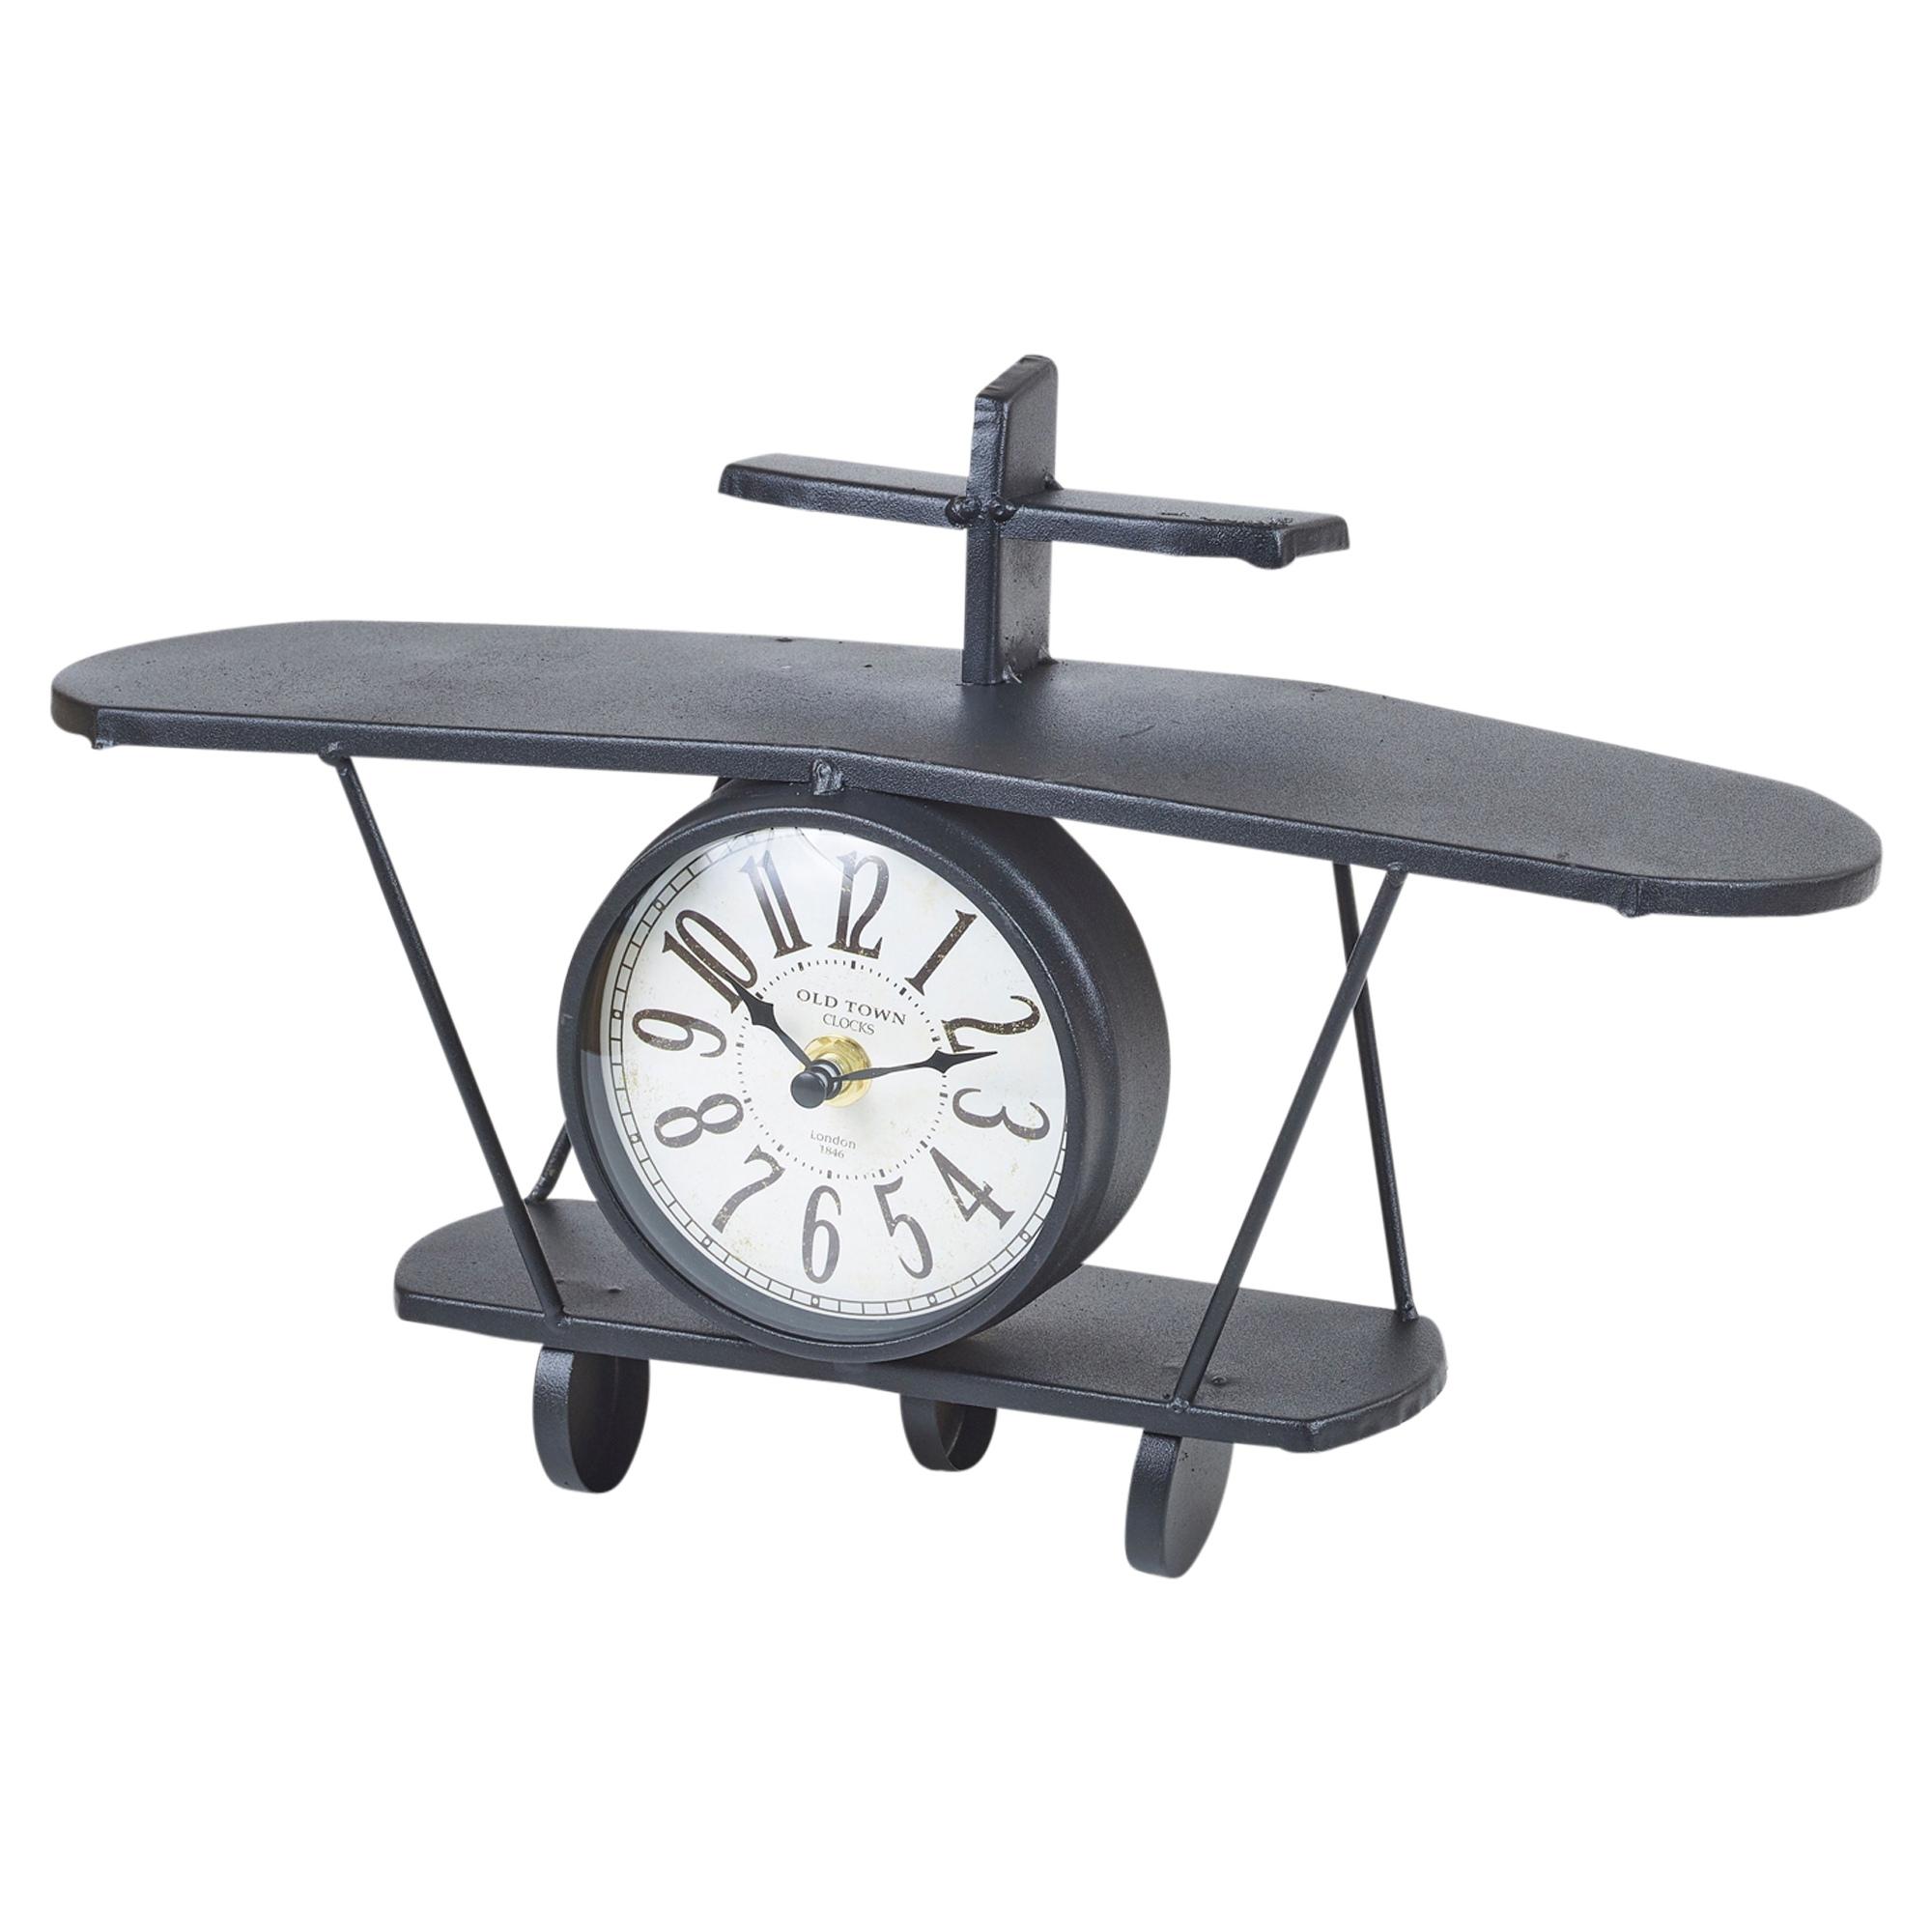 Bookcase /& Shelf Filler 37 x 10 x 20 cm URBNLIVING Novelty Air Plane Clock for Home /& Office Decor 2 Small